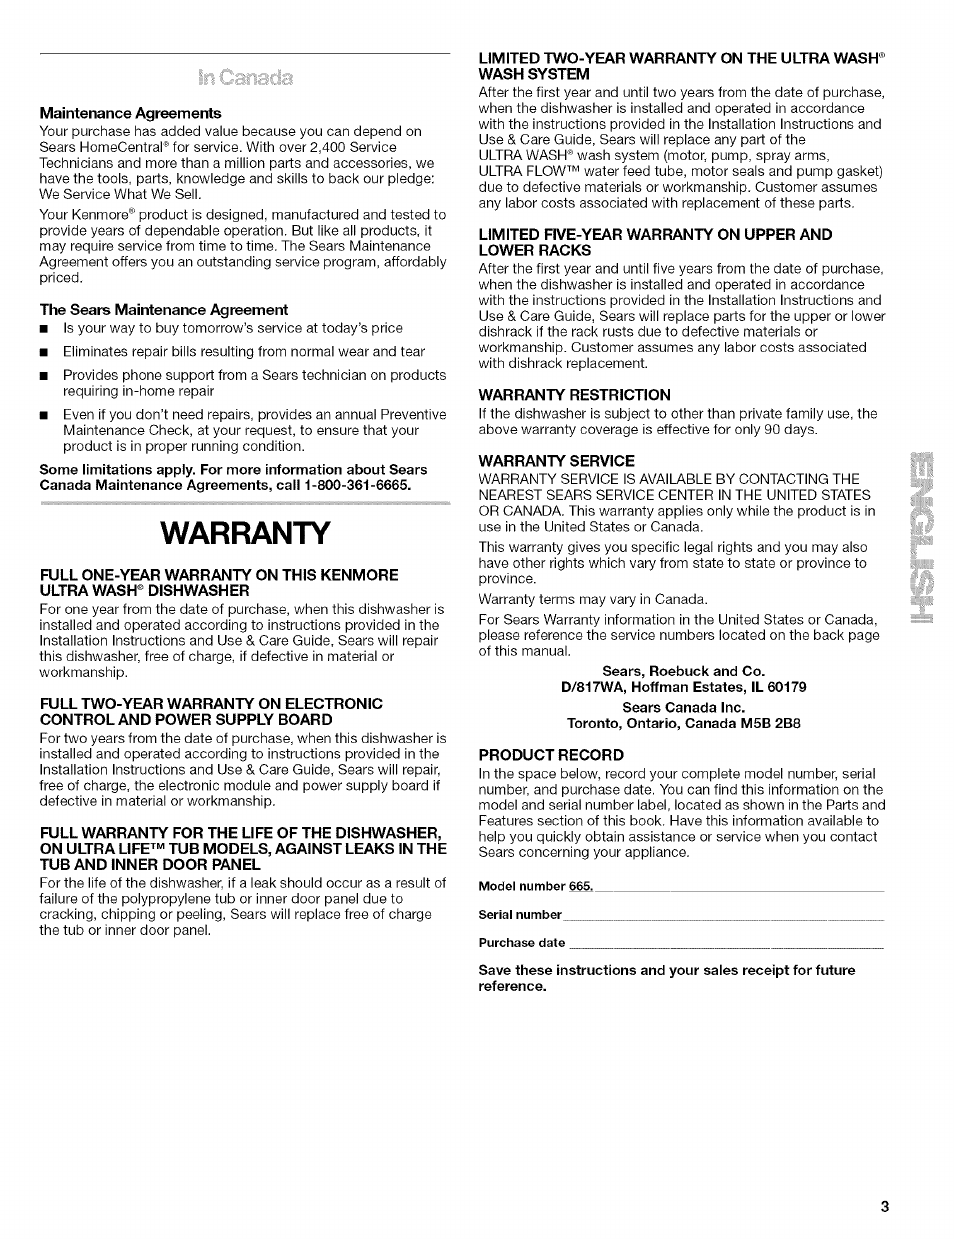 Maintenance agreements, The sears maintenance agreement